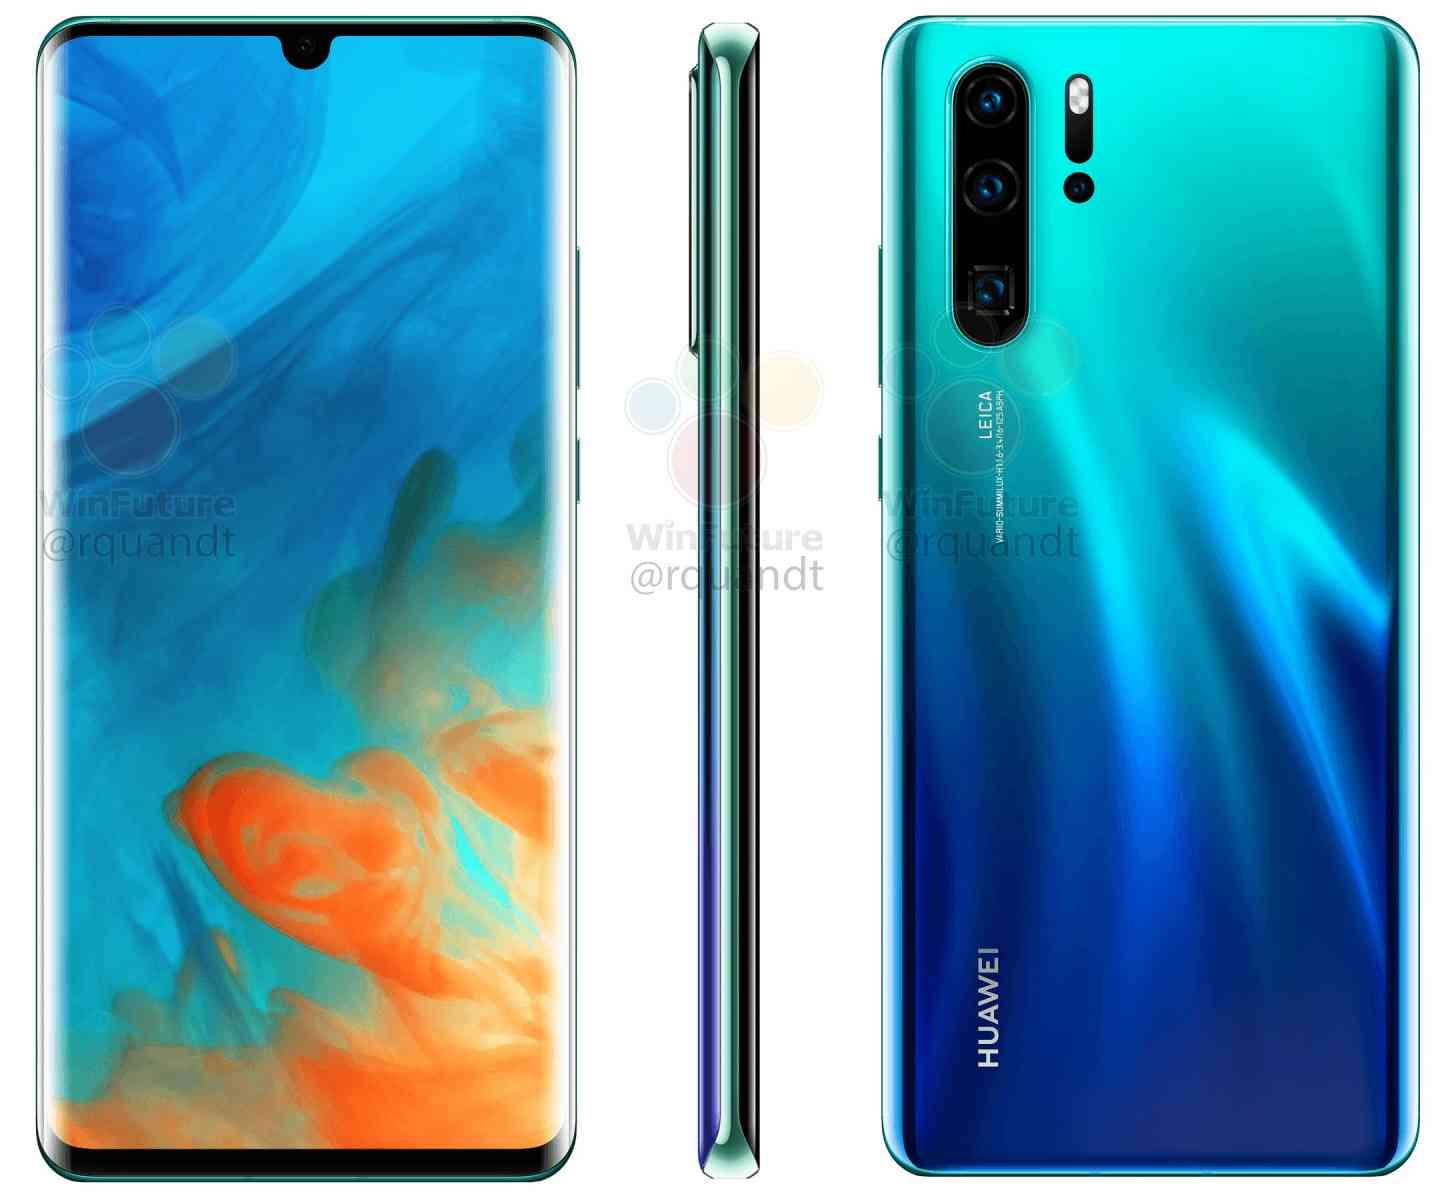 Huawei P30 Pro renders leak